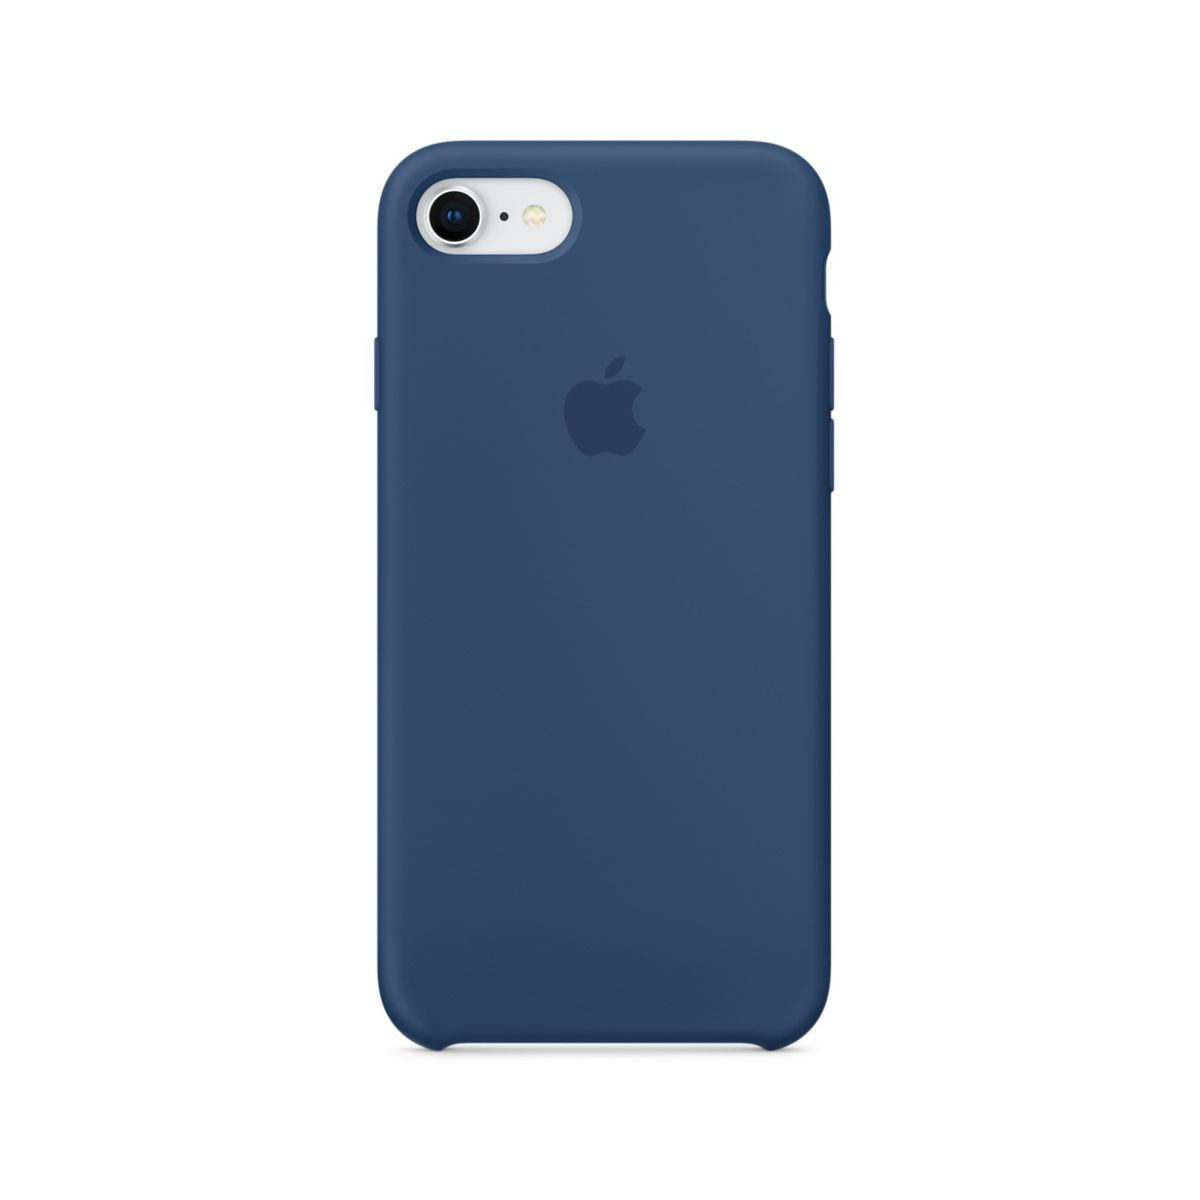 Coque APPLE iPhone 7/8 silicone bleu (photo)